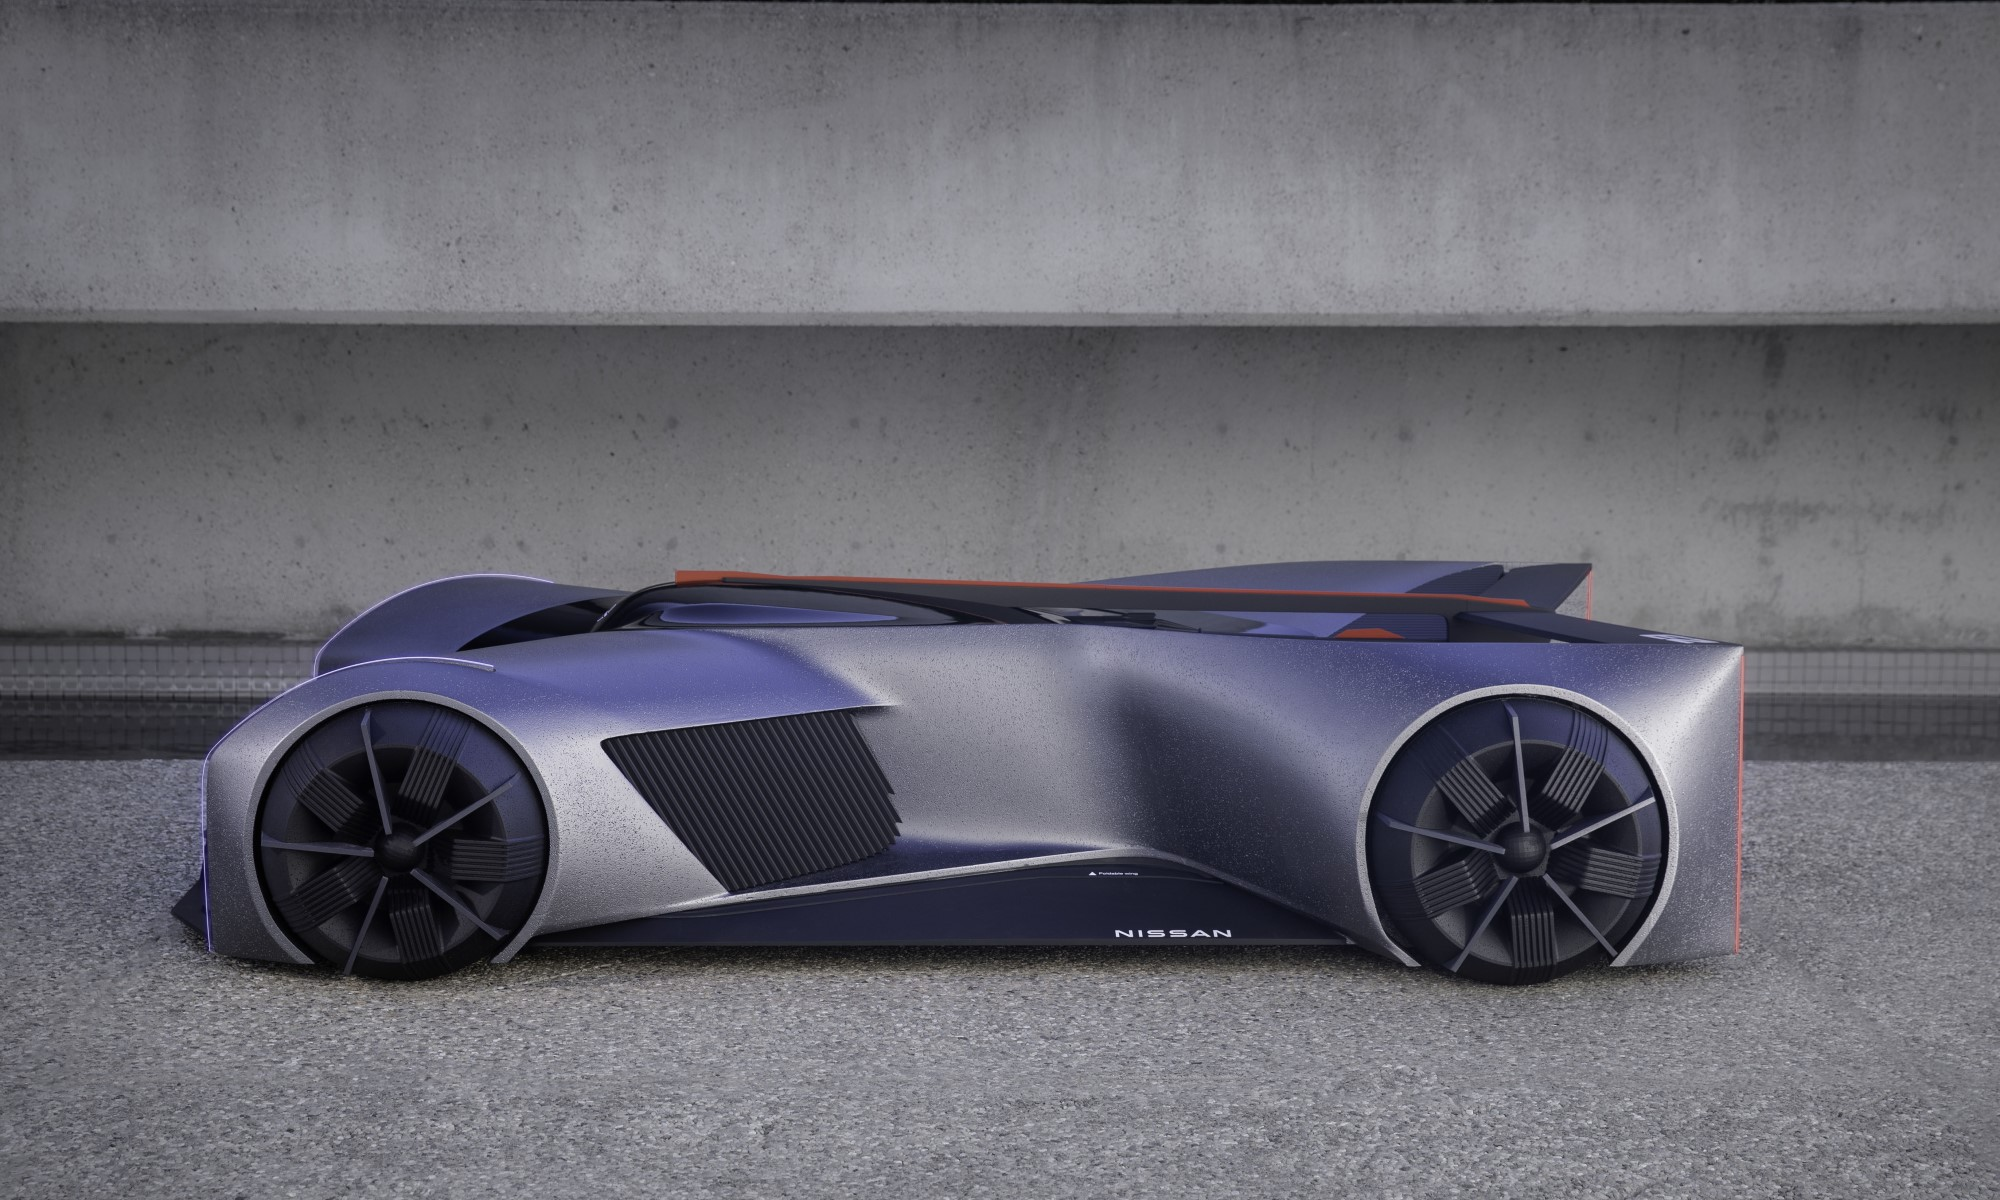 Nissan GT-R X 2050 profile